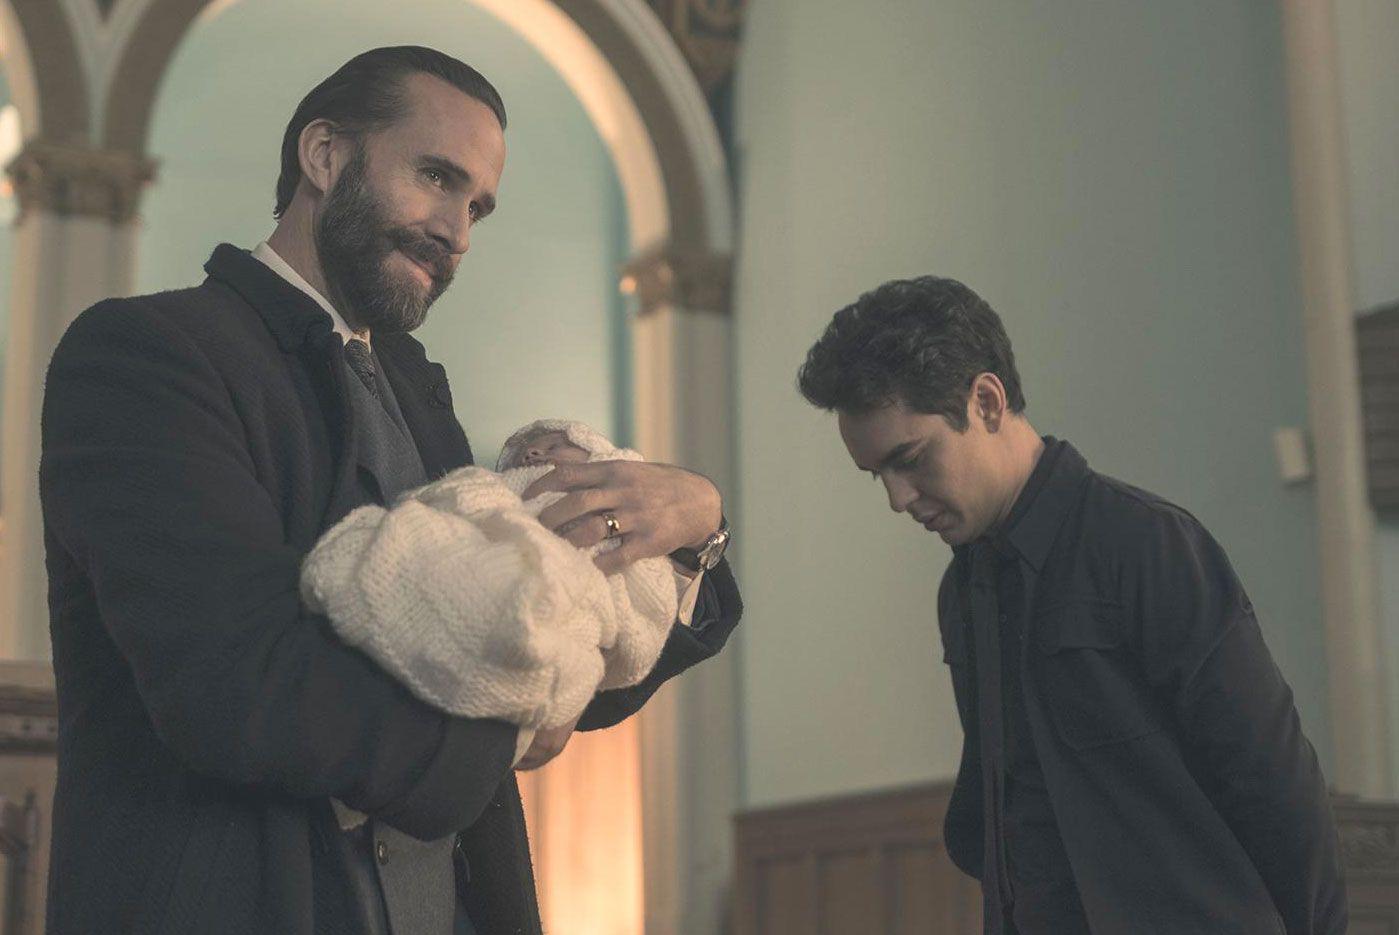 The Handmaid's Tale, Season 2 finale, Commander Waterford (Joseph Fiennes) and Nick (Max Minghella)